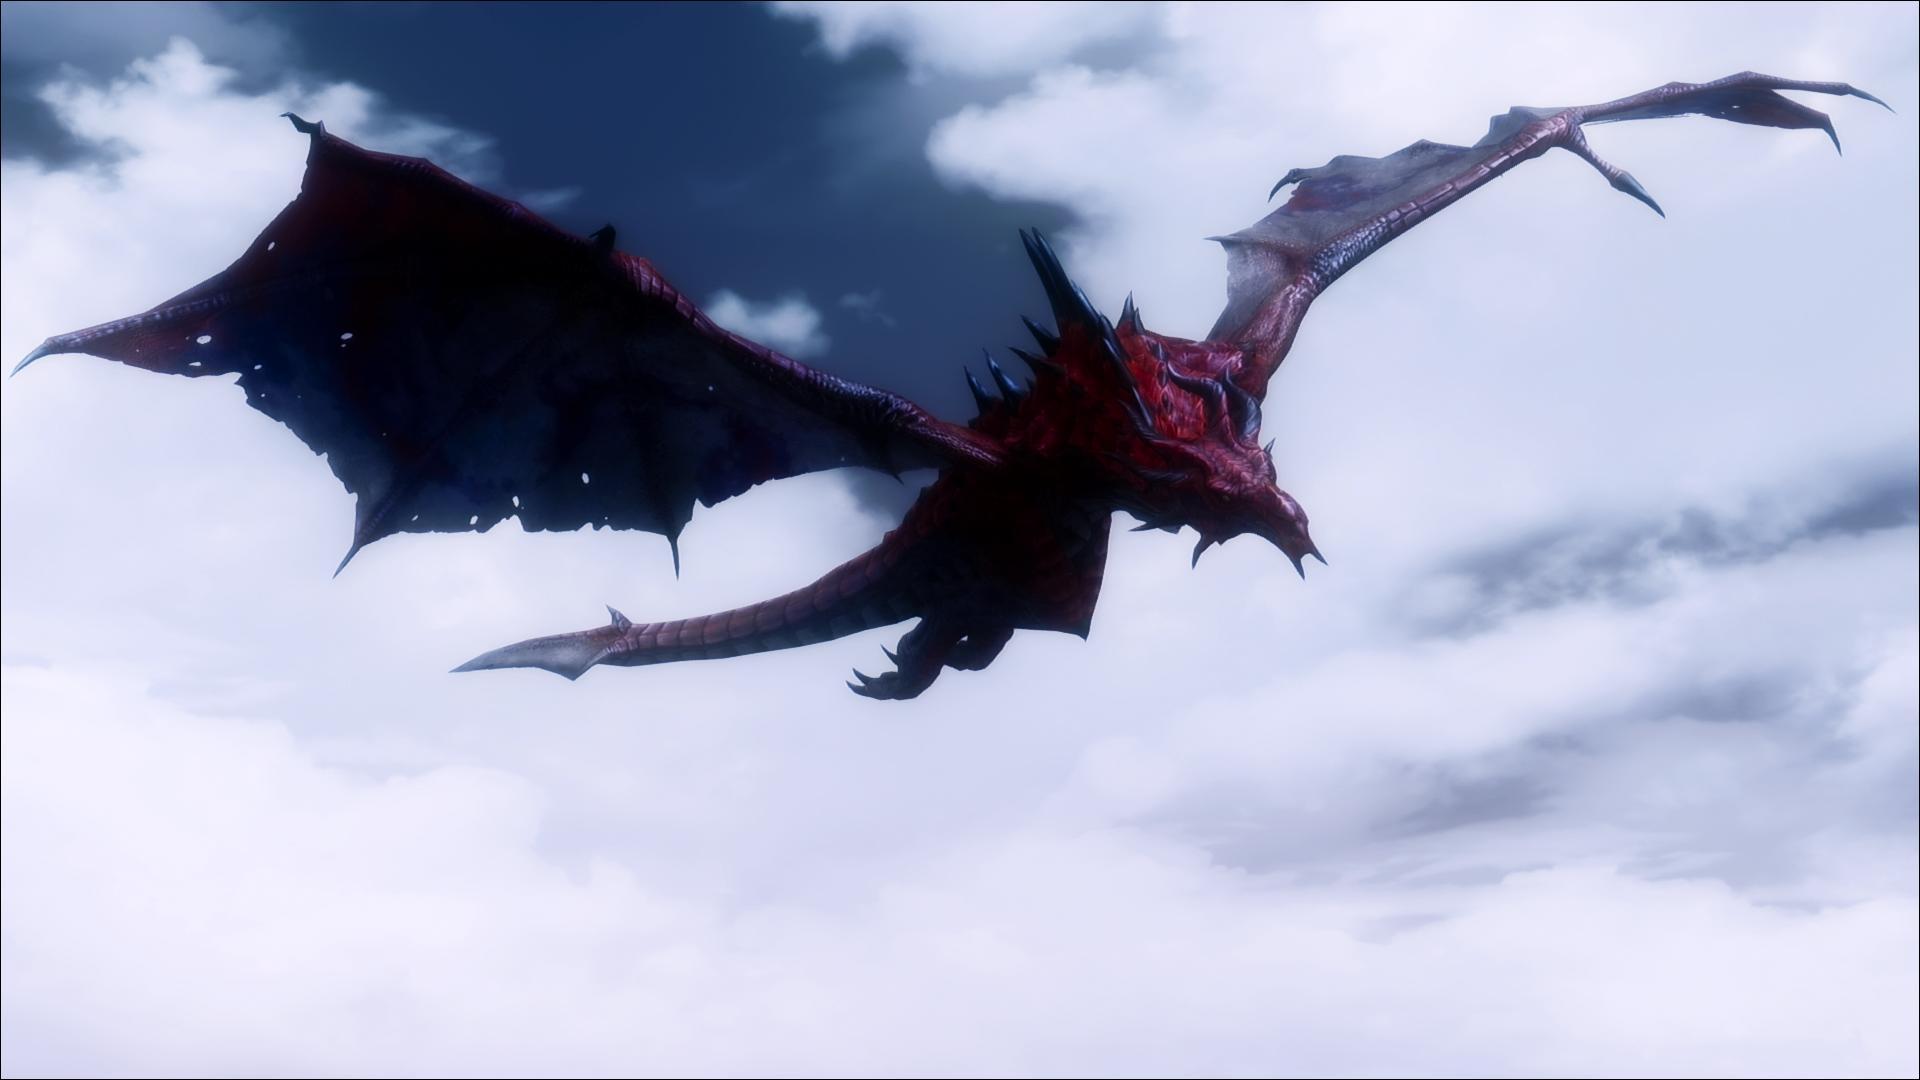 Wallpaper : flying, Mod, dragon, pics, Flight, scenic